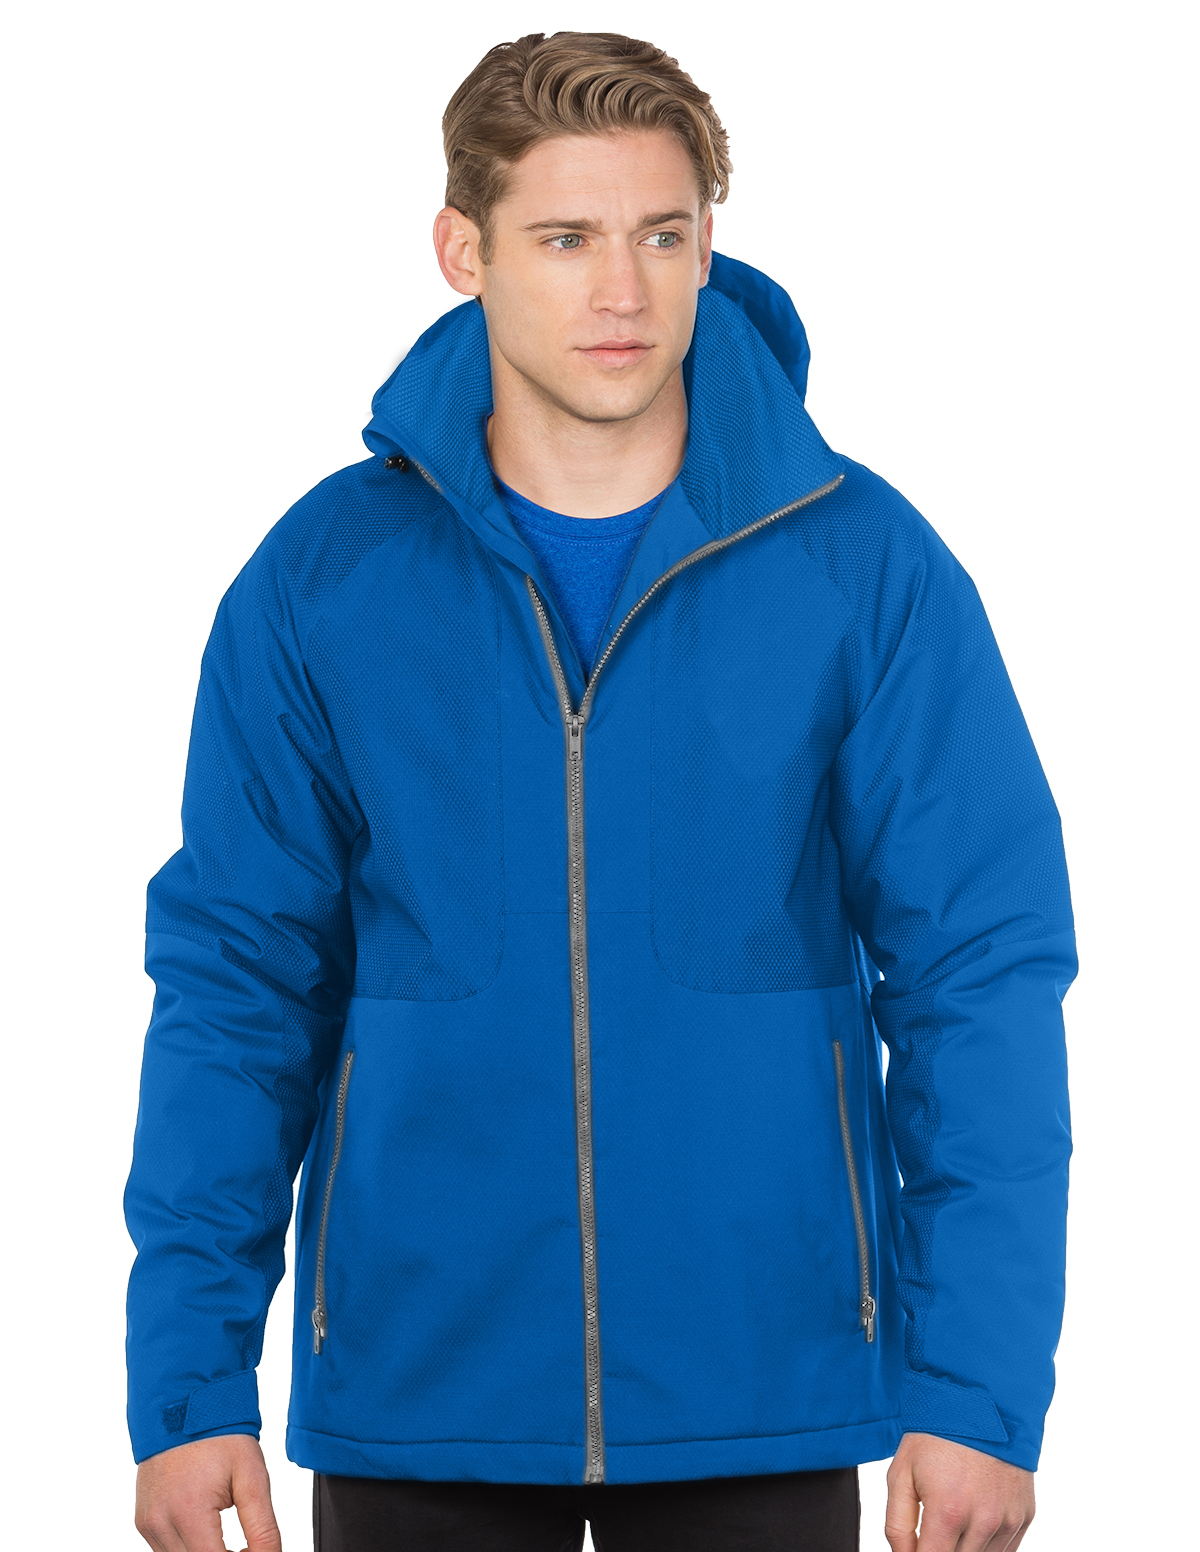 Bellwood-Mens Hooded Honeycomb Poly/Fleece Jacket-Tri-Mountain